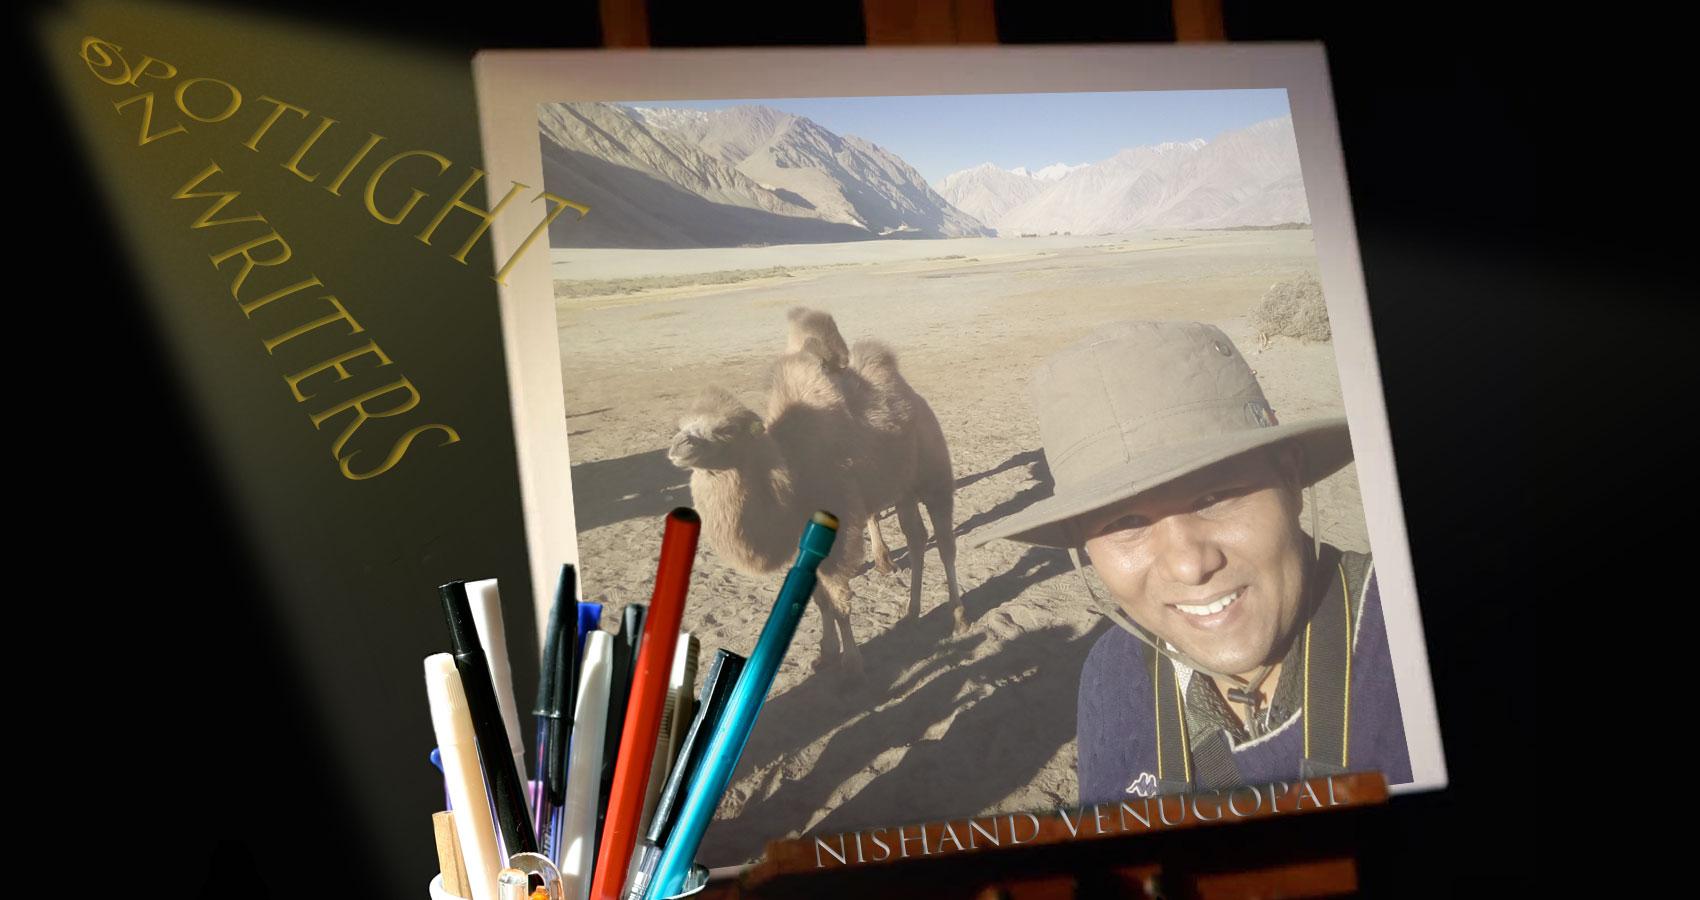 Spotlight On Writers - Nishand Venugopal at Spillwords.com